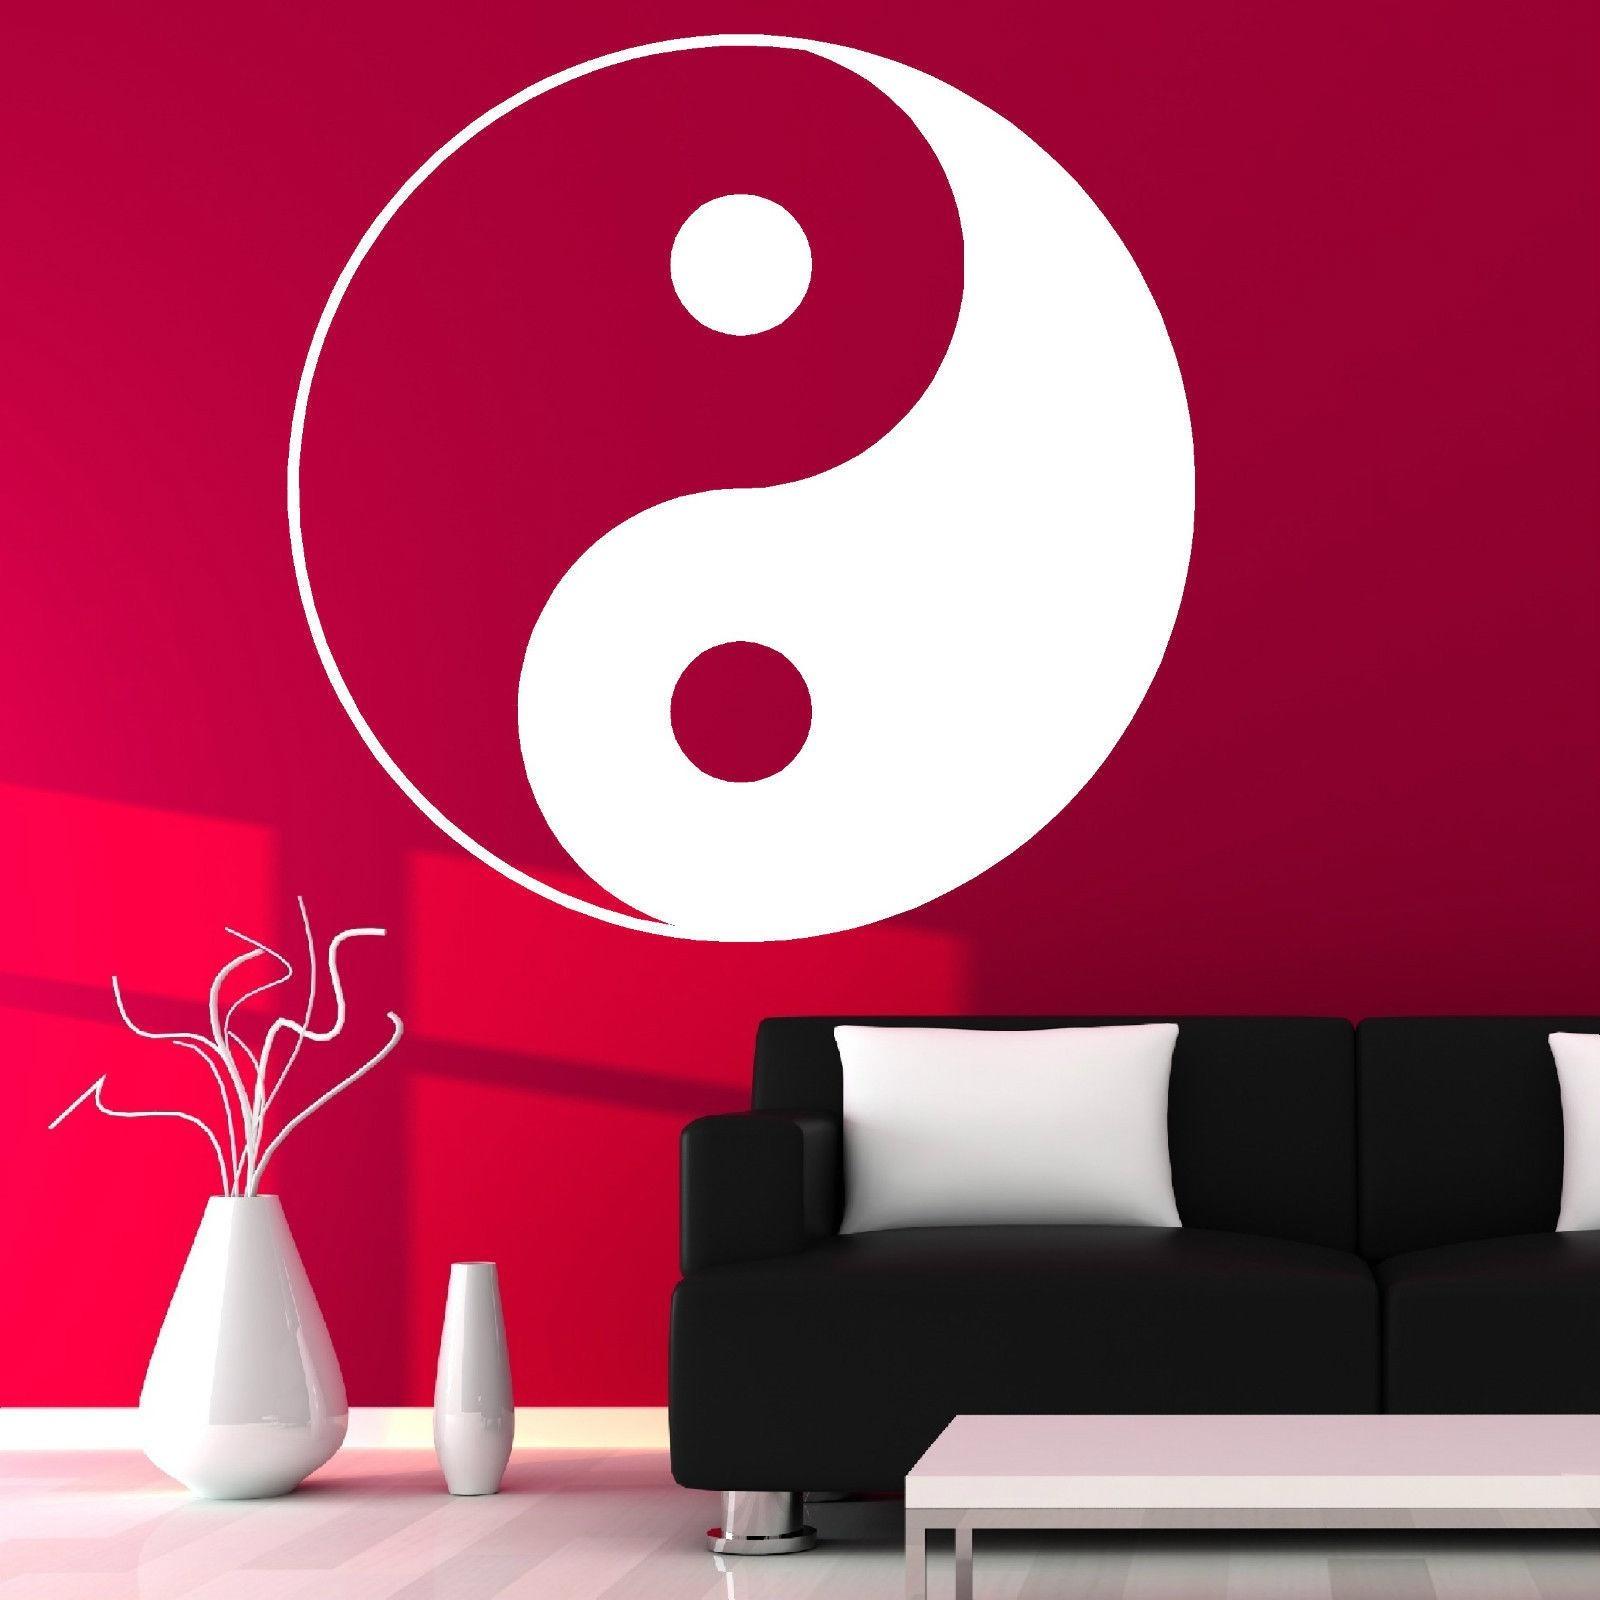 Aliexpress : Buy D189 Yin Yang Symbol Ying Yang Wall Art Room Inside Chinese Symbol Wall Art (Image 1 of 20)